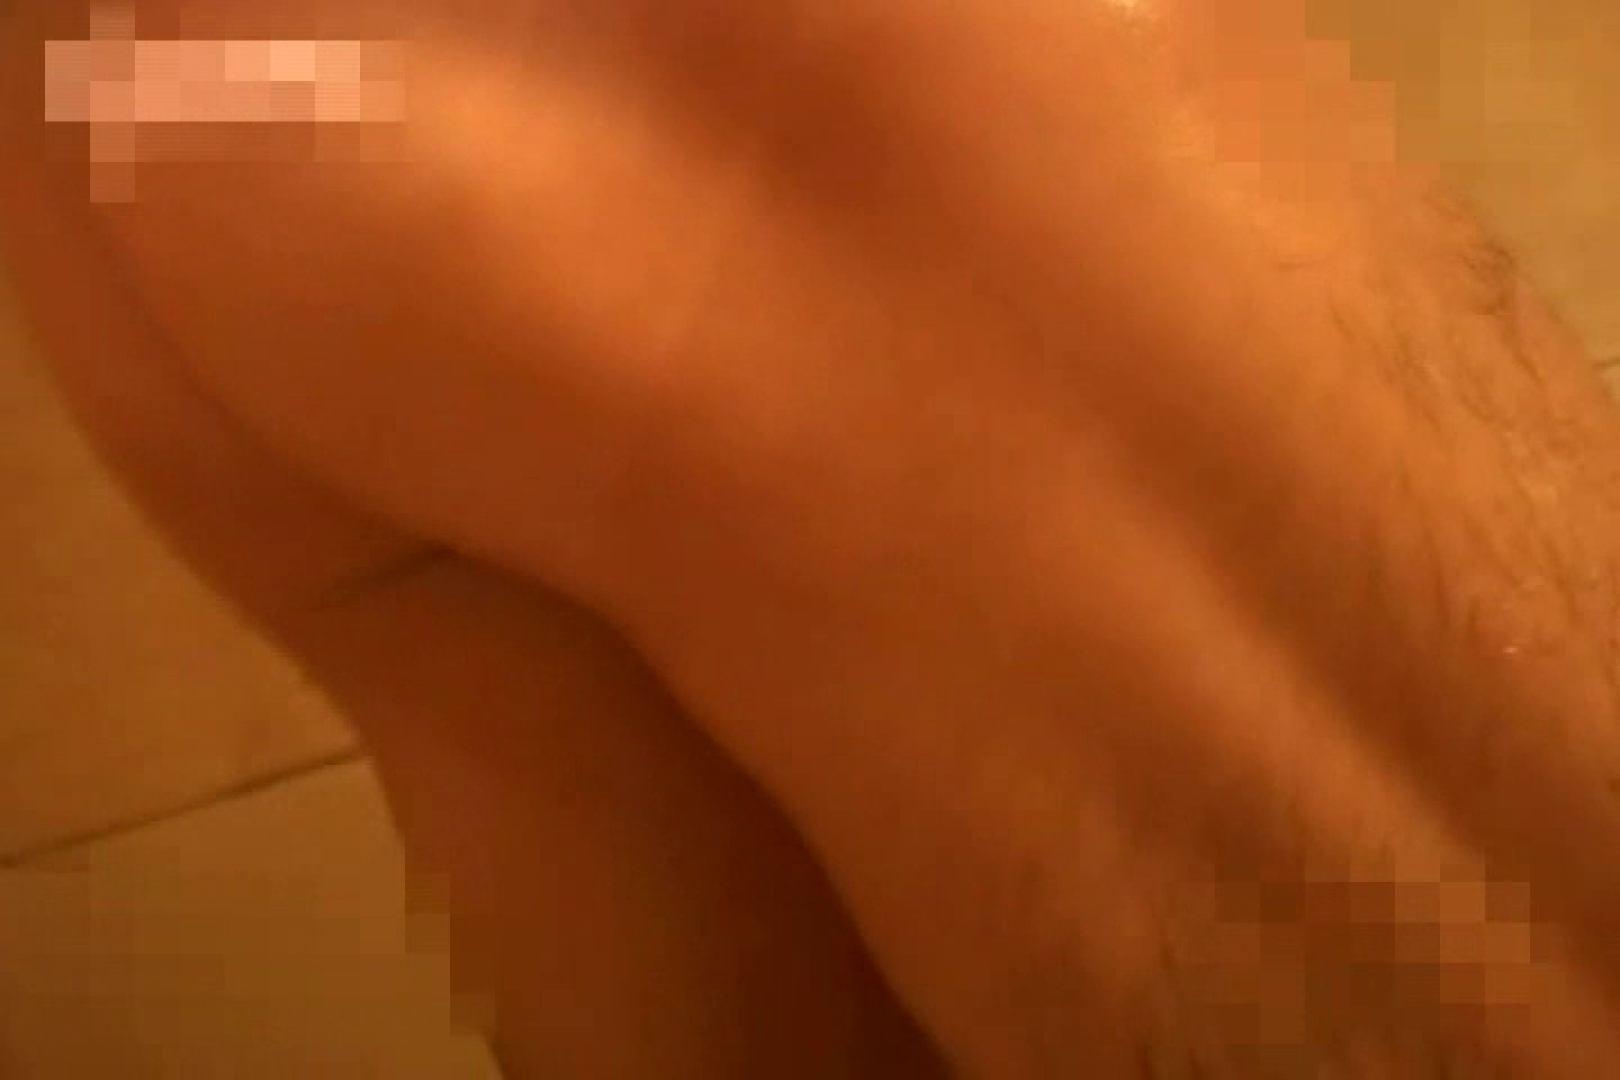 Beautiful muscle モッコリ野郎達!Vol.03 スリム美少年系ジャニ系 おちんちん画像 44連発 9